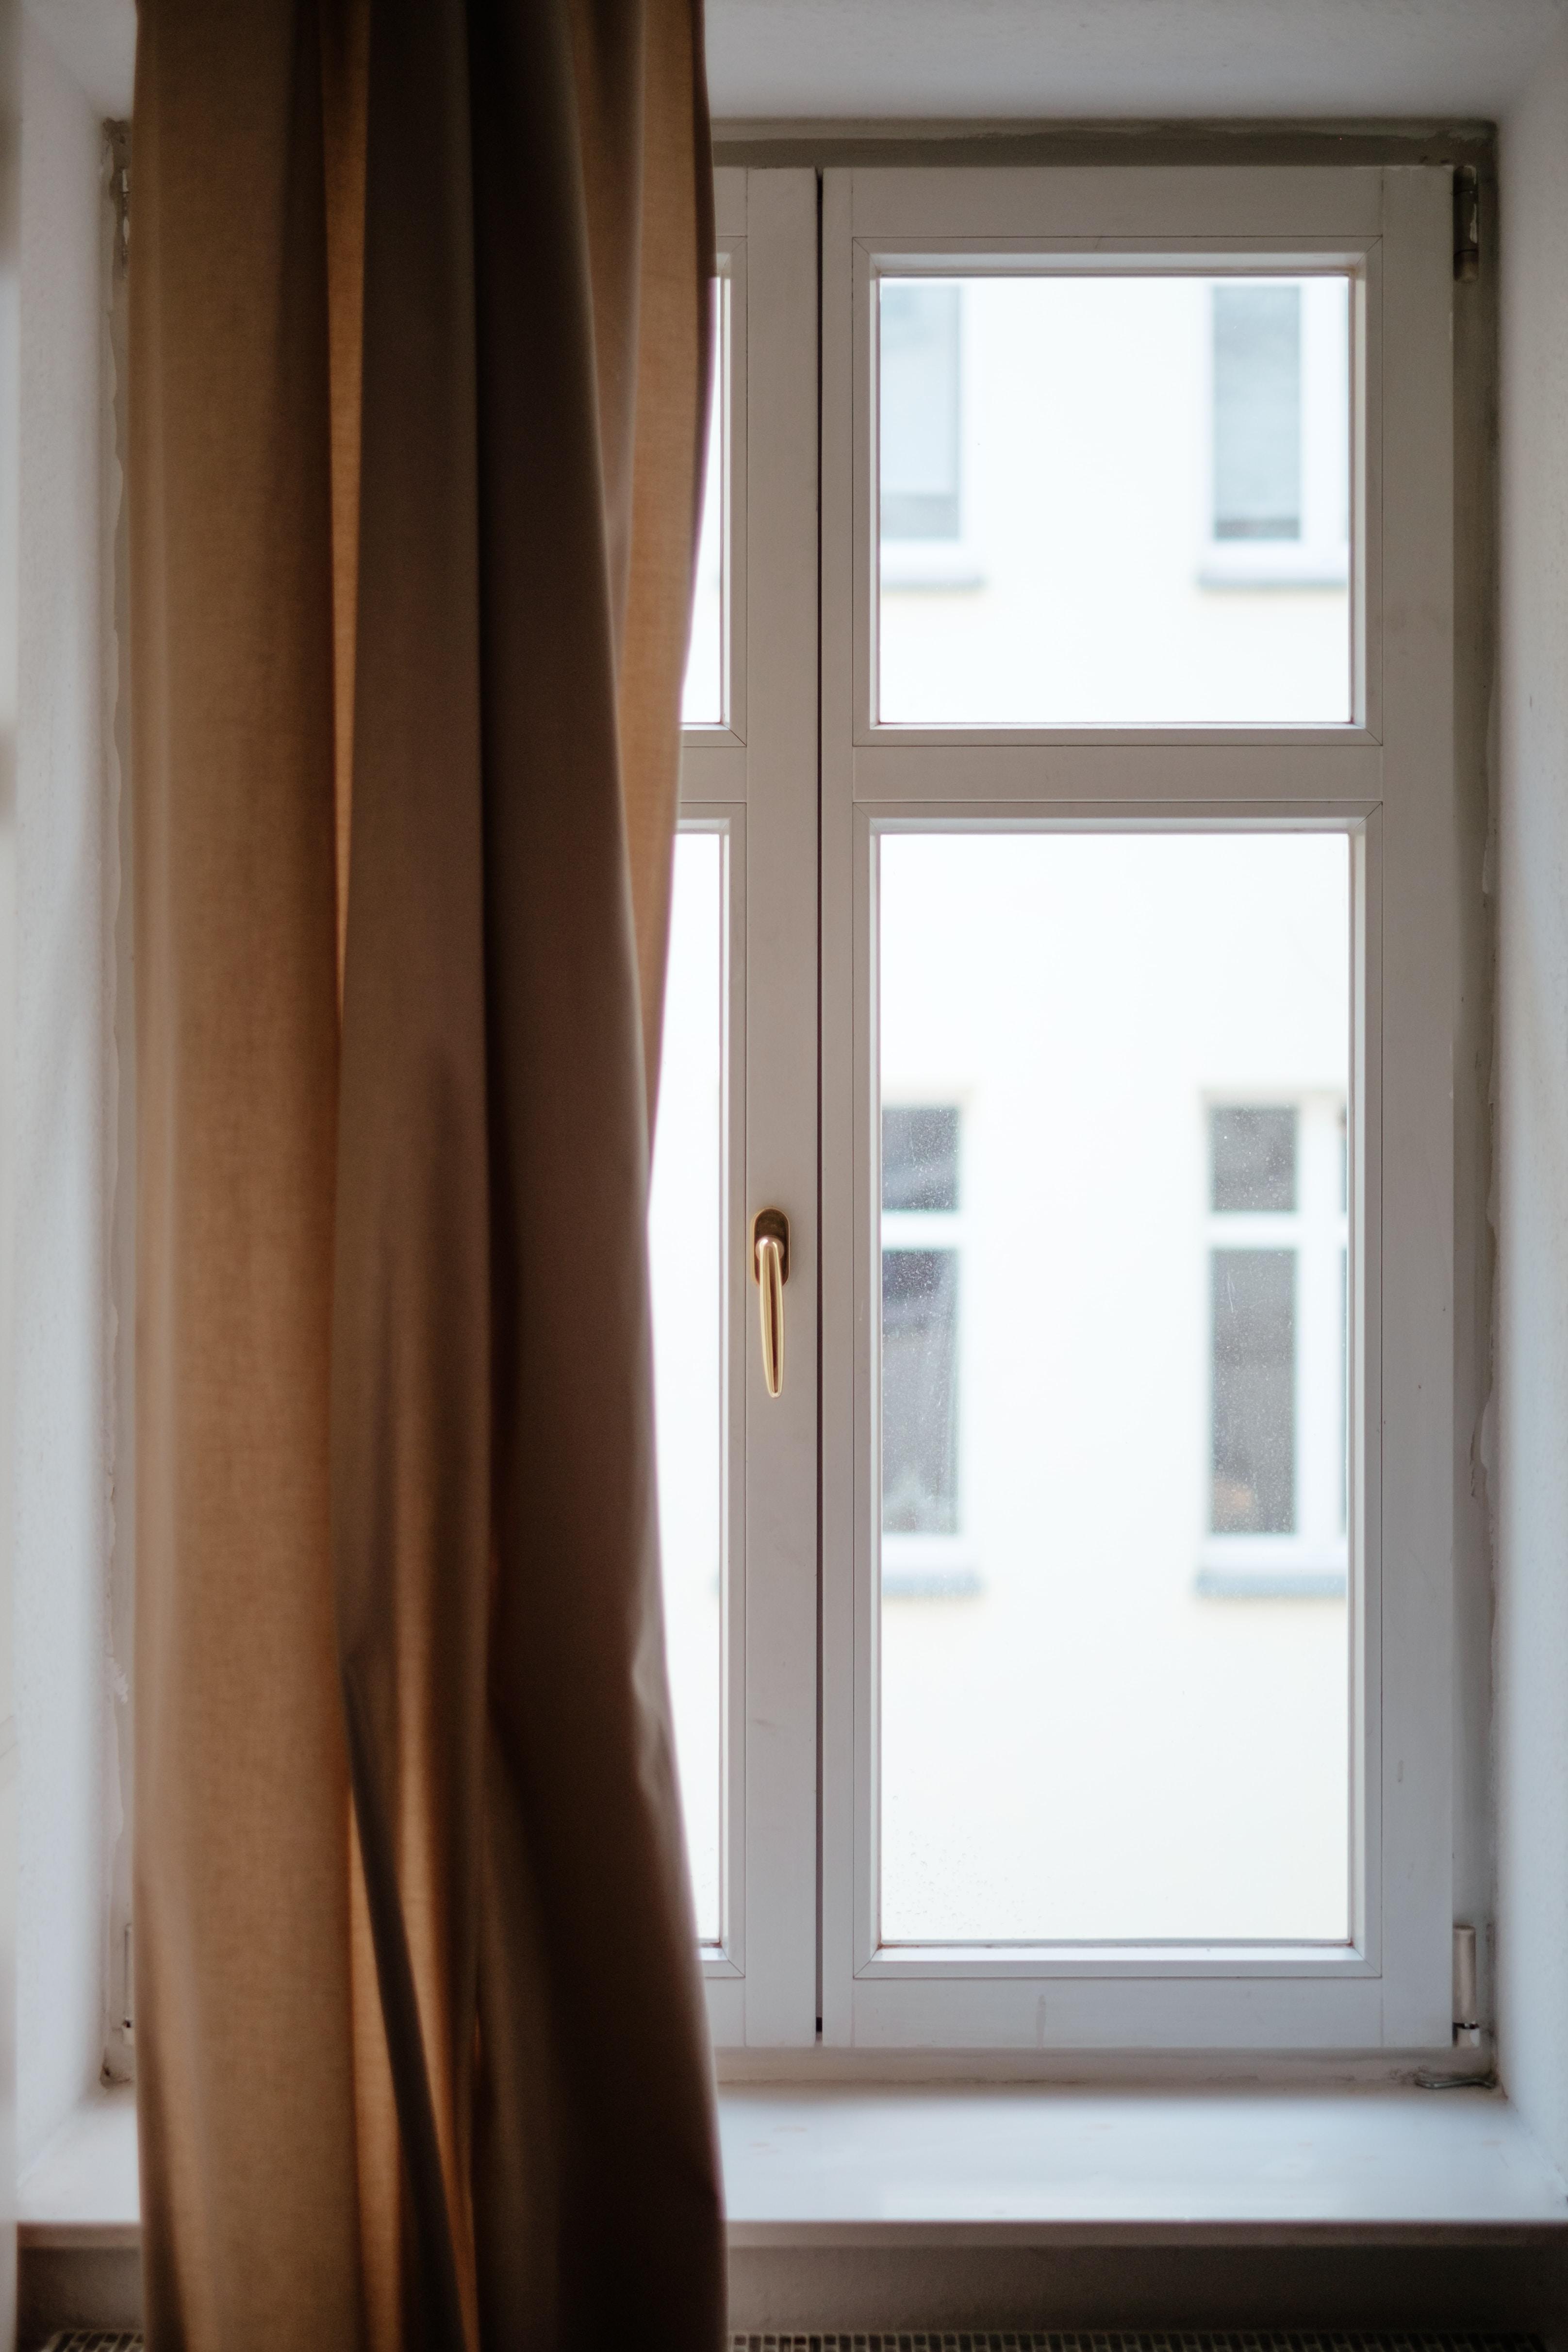 closeup photo of glass window